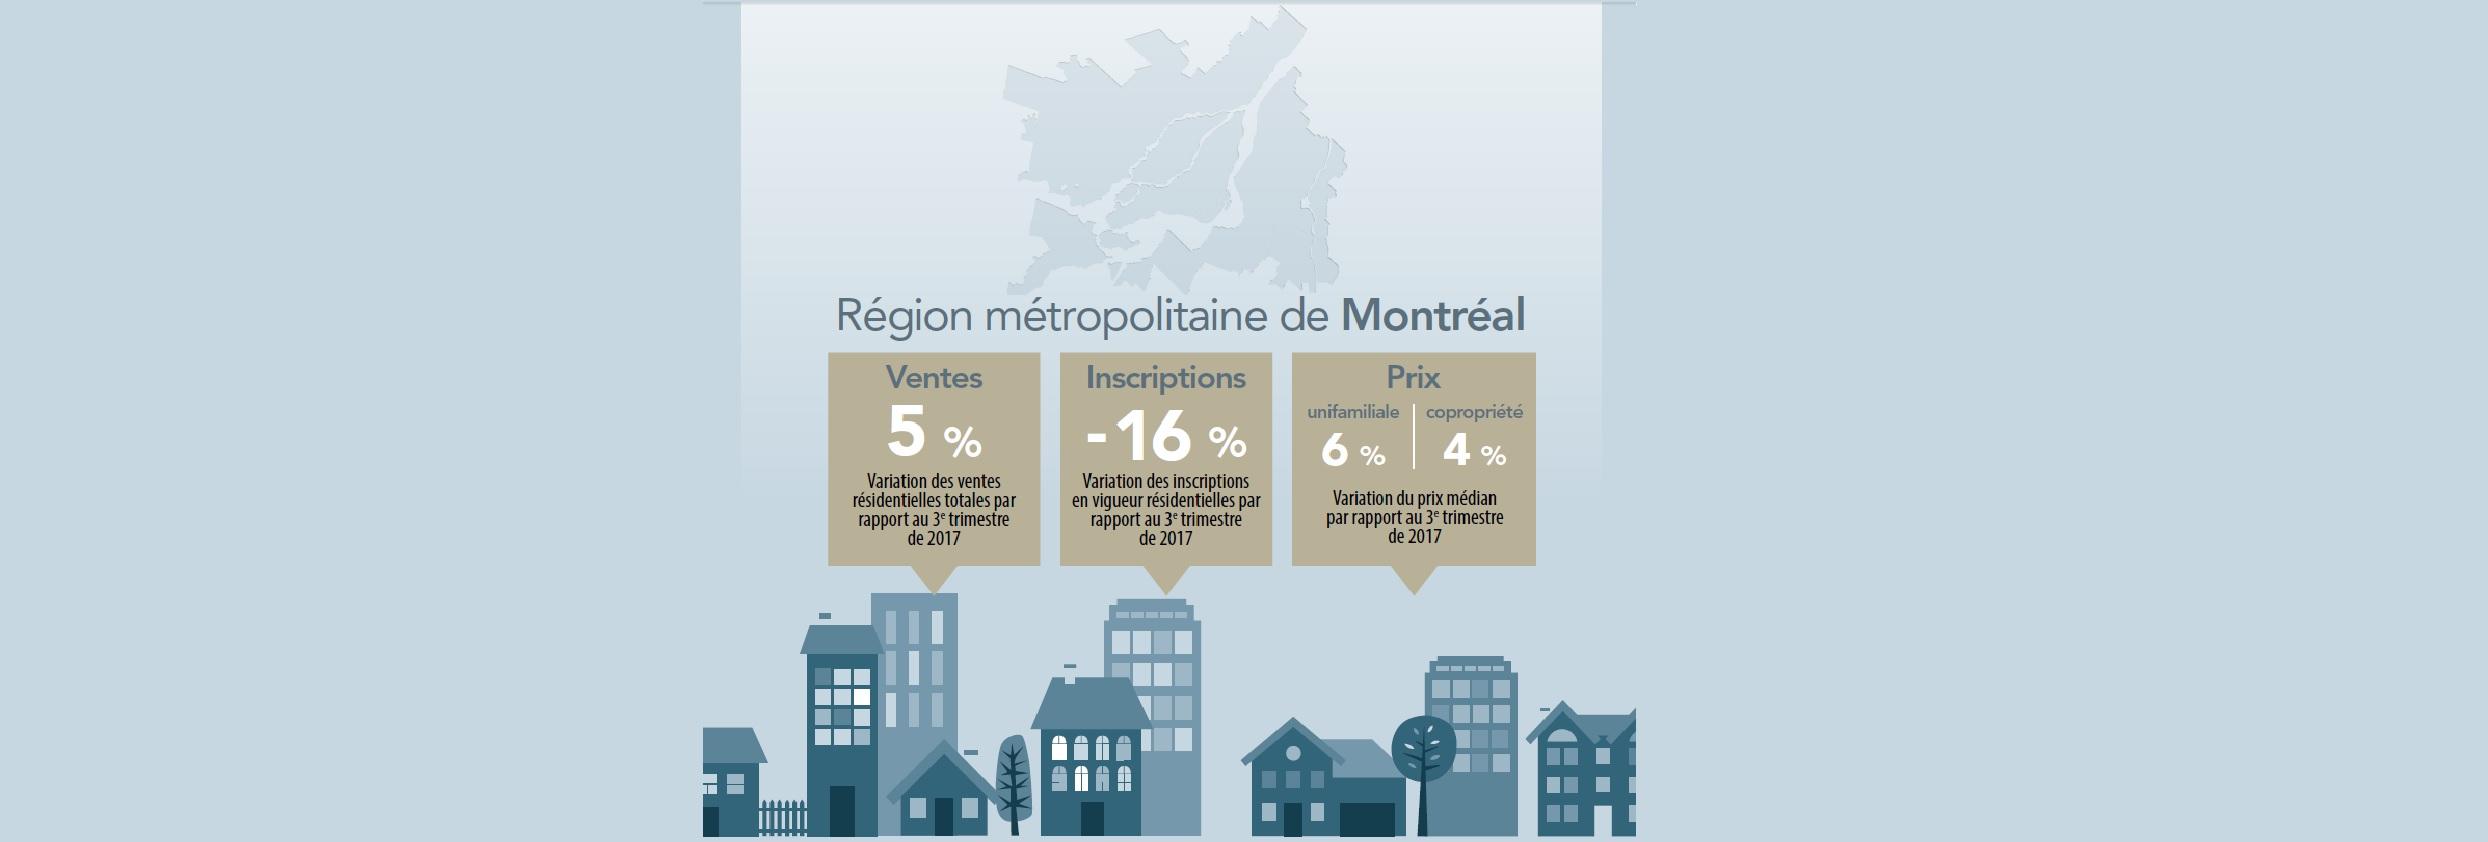 Stats Logo French.jpg